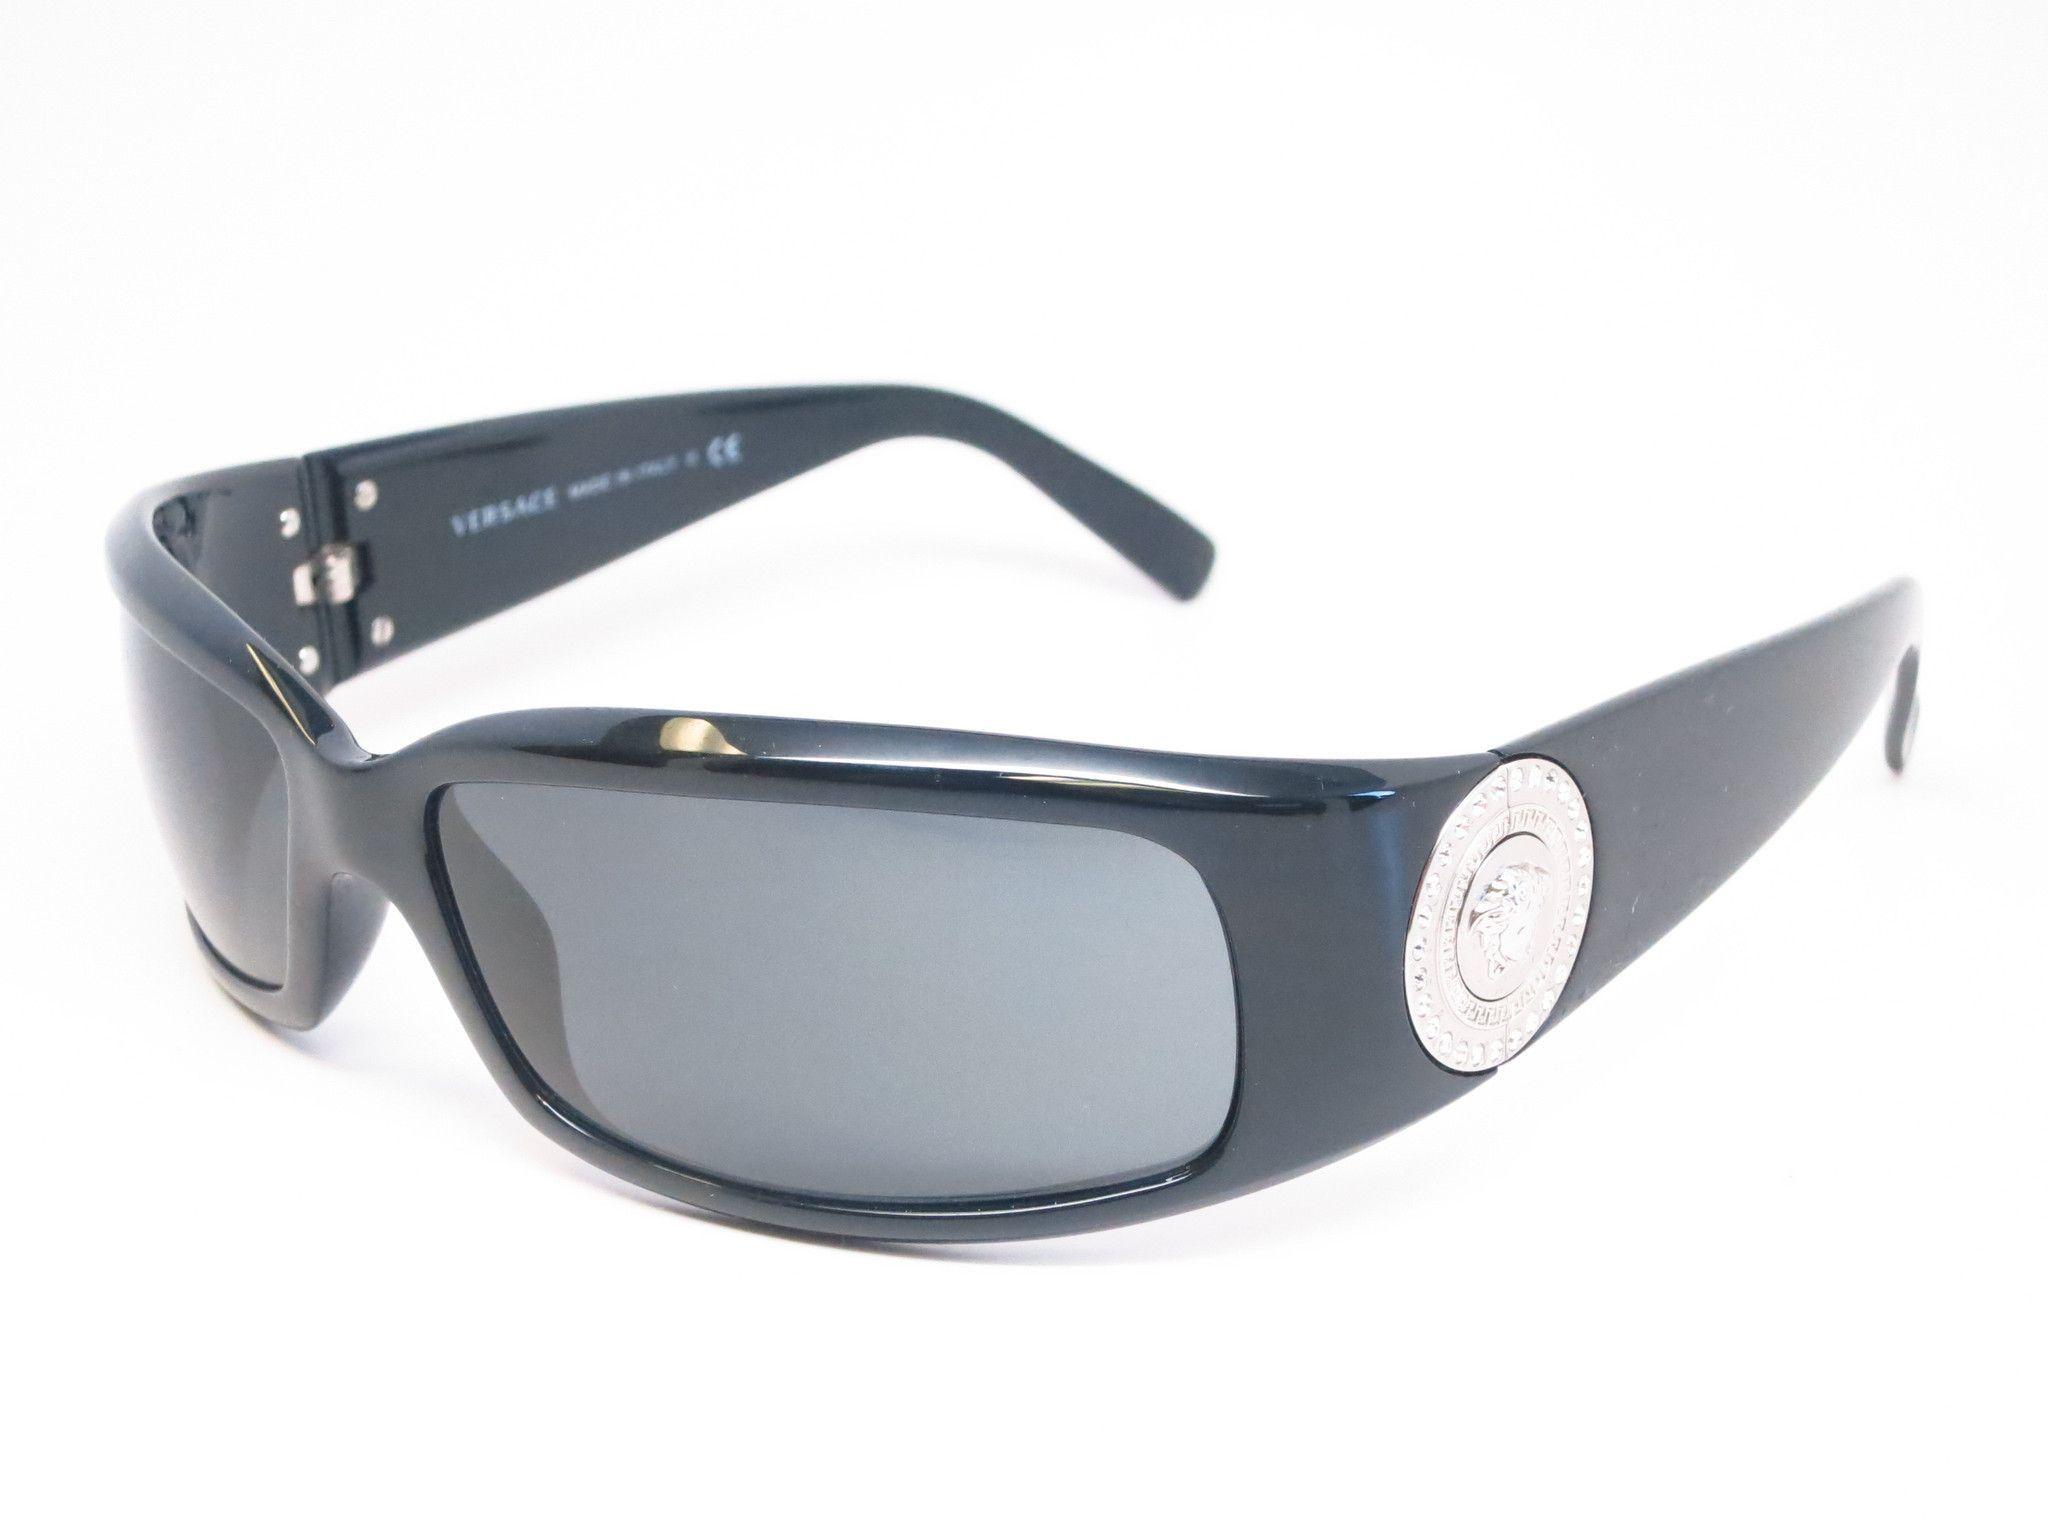 27716a46a0 Versace VE 4044-B Shiny Black GB1 87 Sunglasses